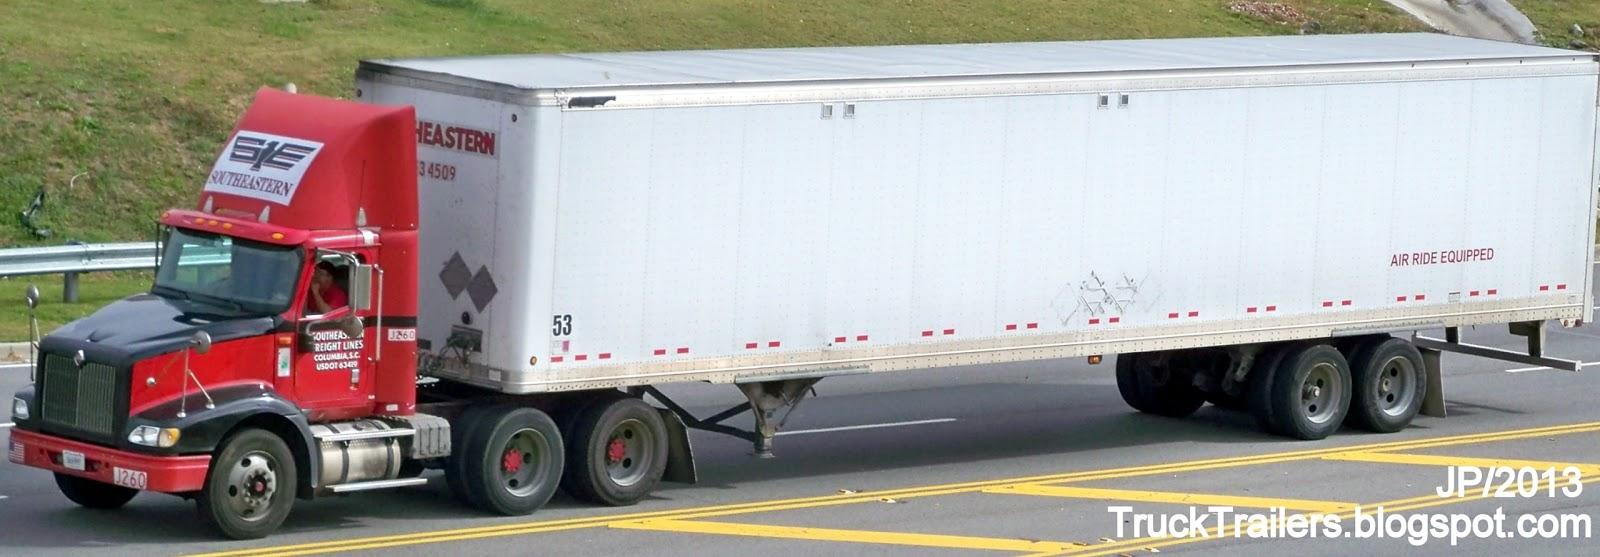 Southeastern freight lines columbia south carolina international day cab truck 53 dry van trailer southeastern freight lines columbia sc